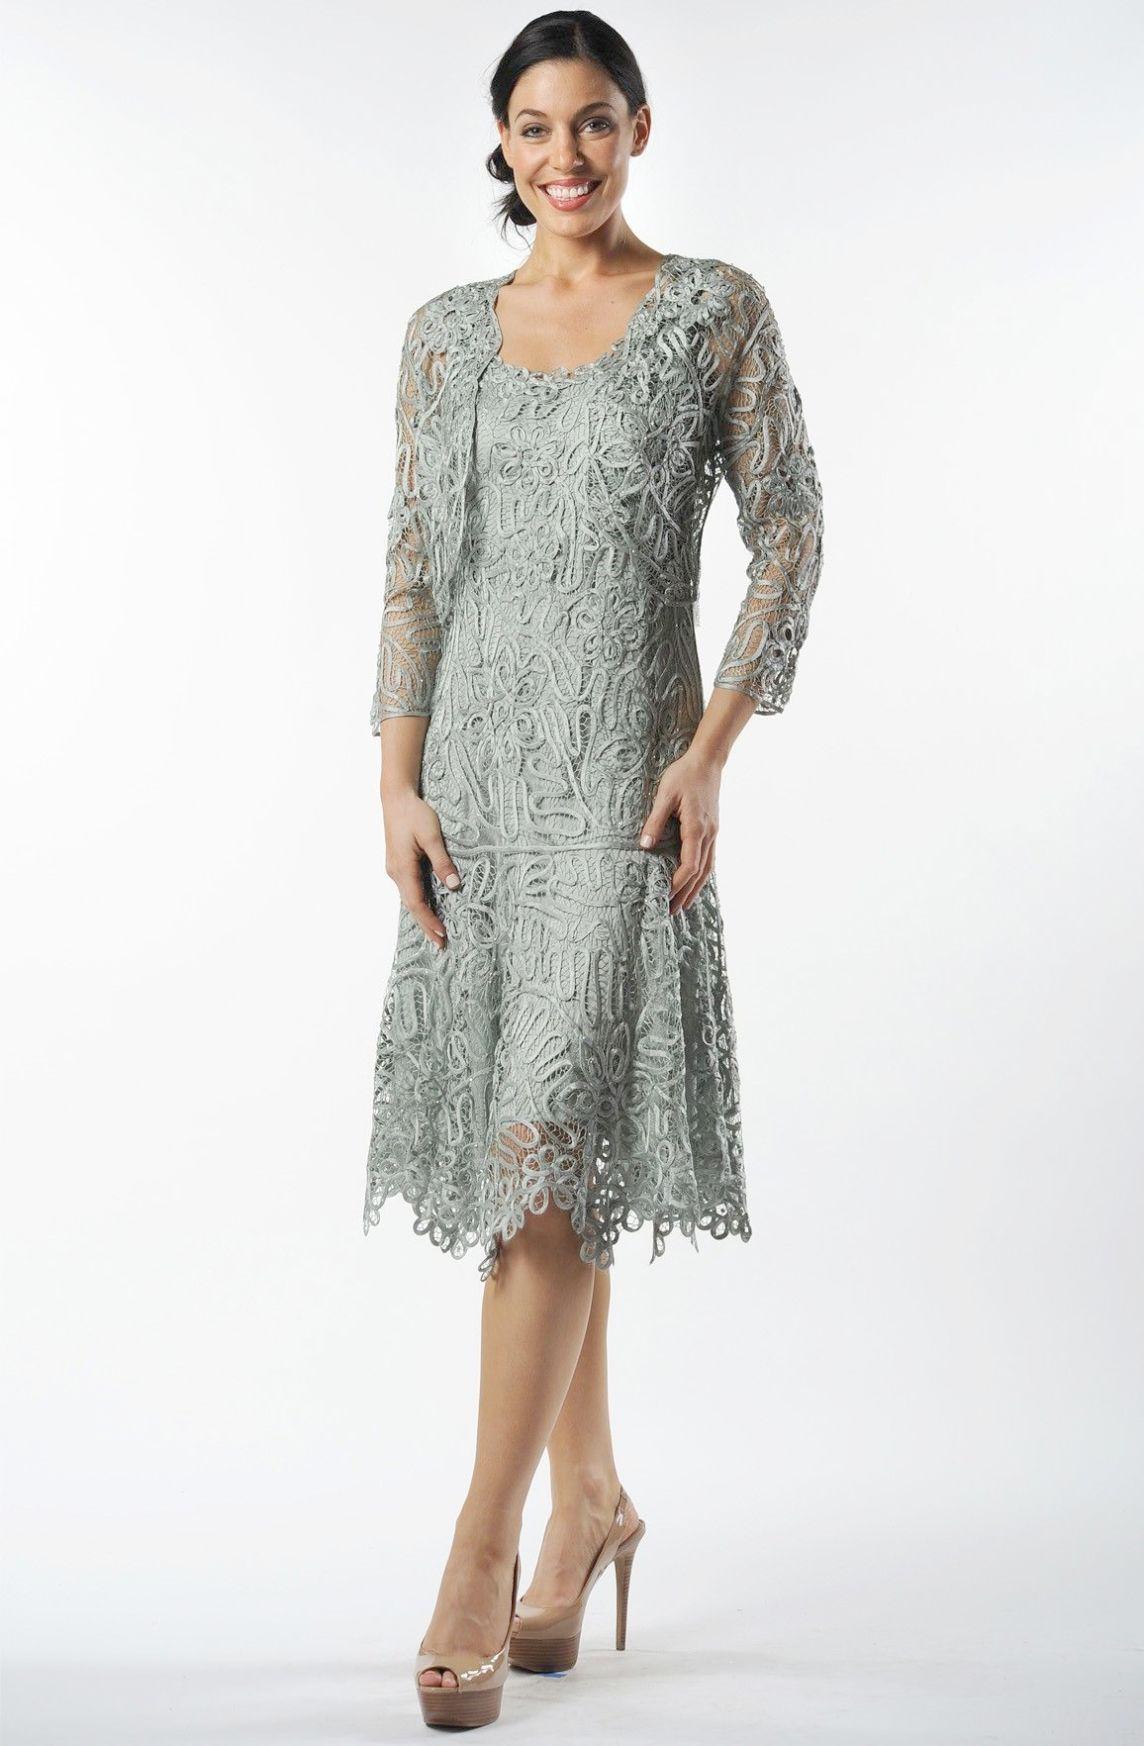 Wedding dress patterns free  Crochet Dress Blanket Pattern Free Knitted Dress Patterns For